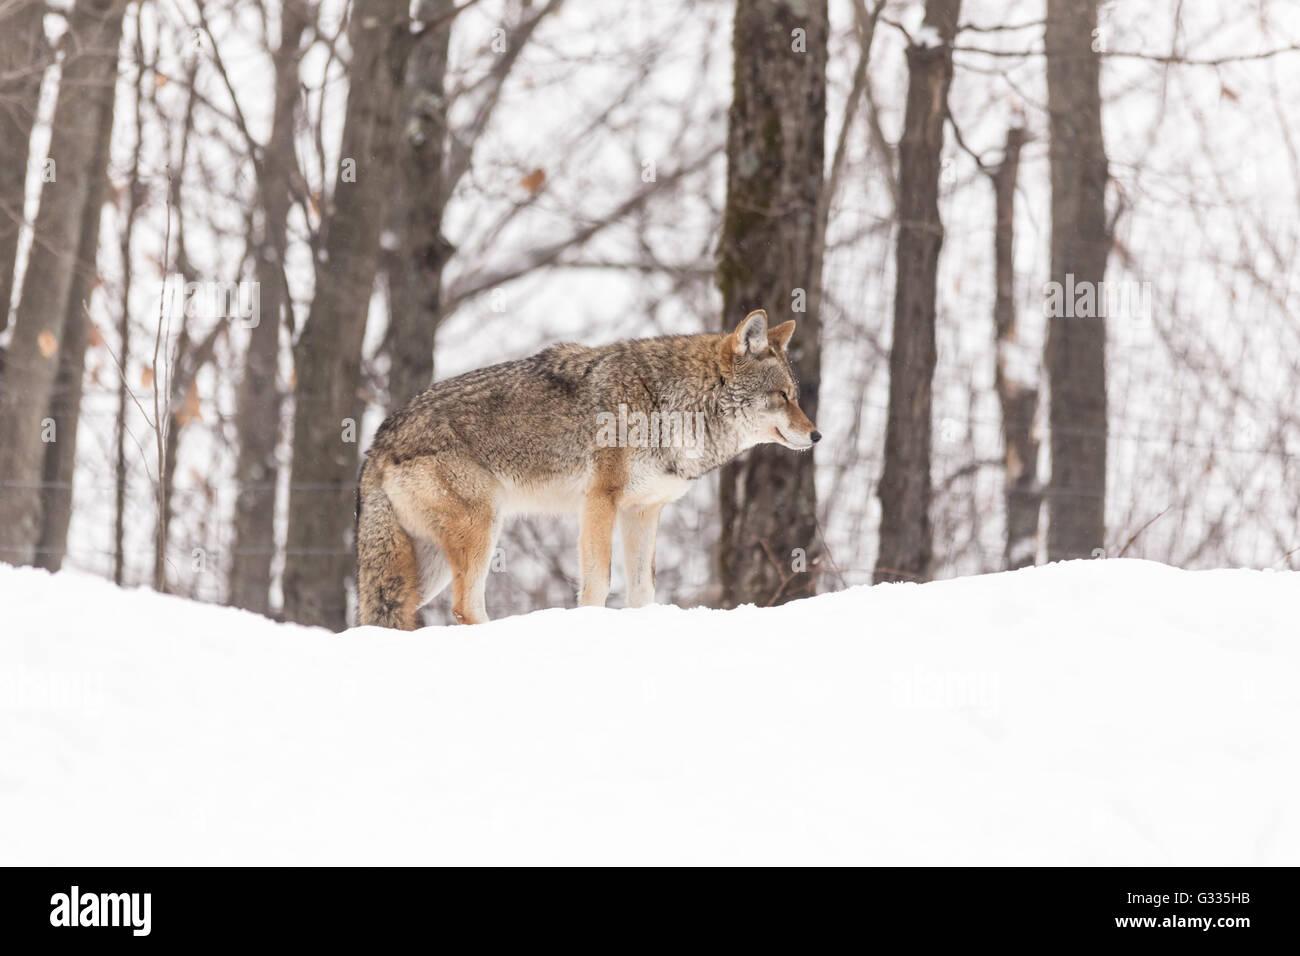 A lone coyote in a winter scene - Stock Image